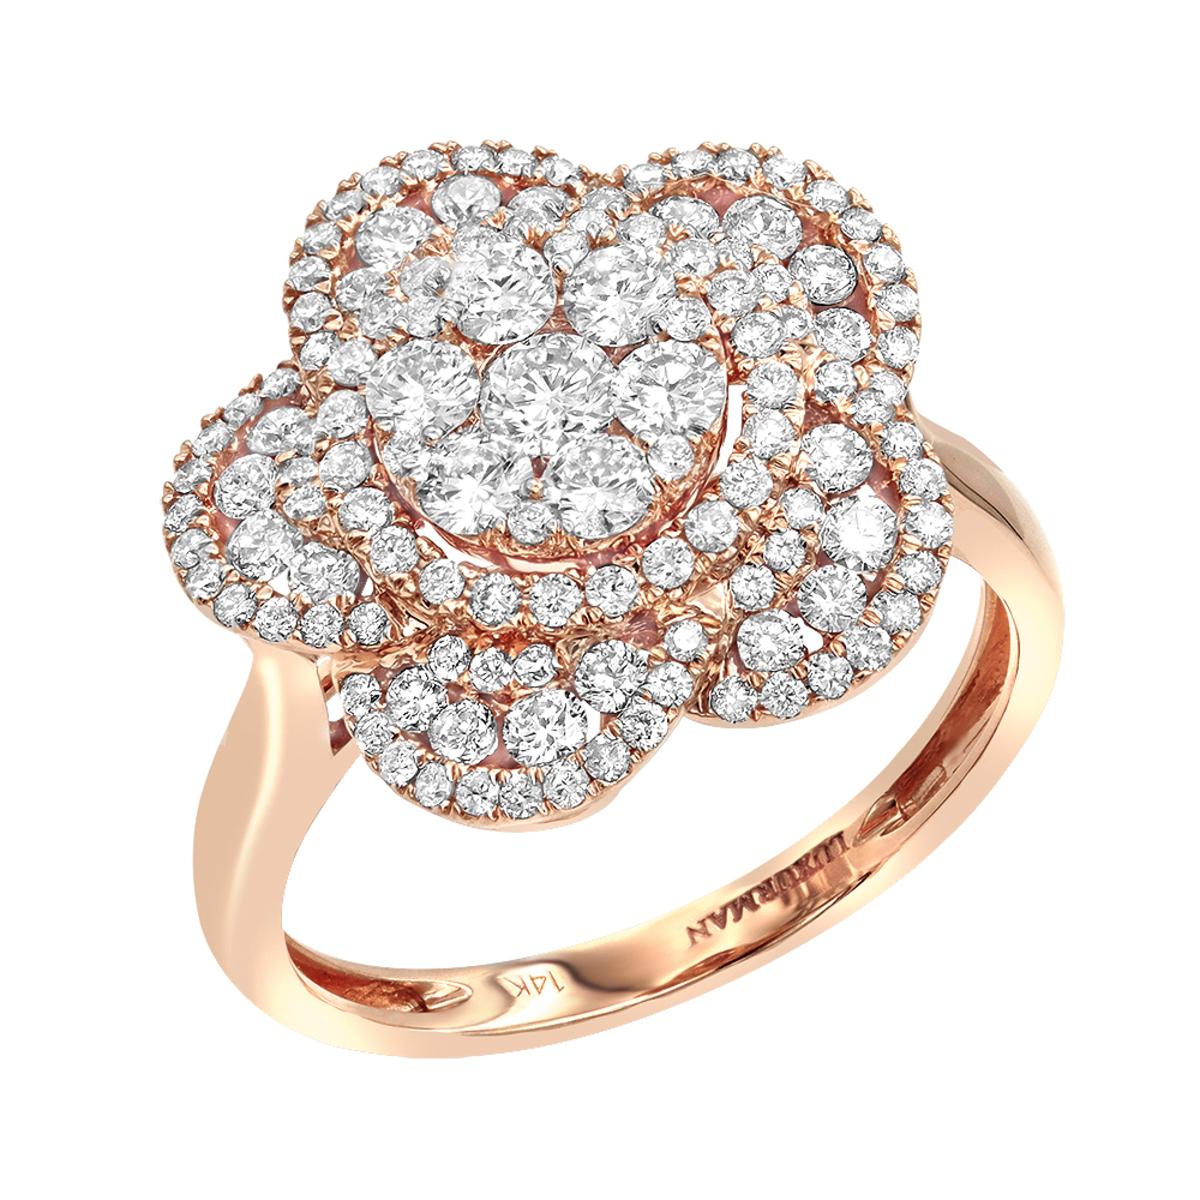 14K Gold Designer Diamond Flower Ladies Cocktail Ring 1.5ct by Luxurman